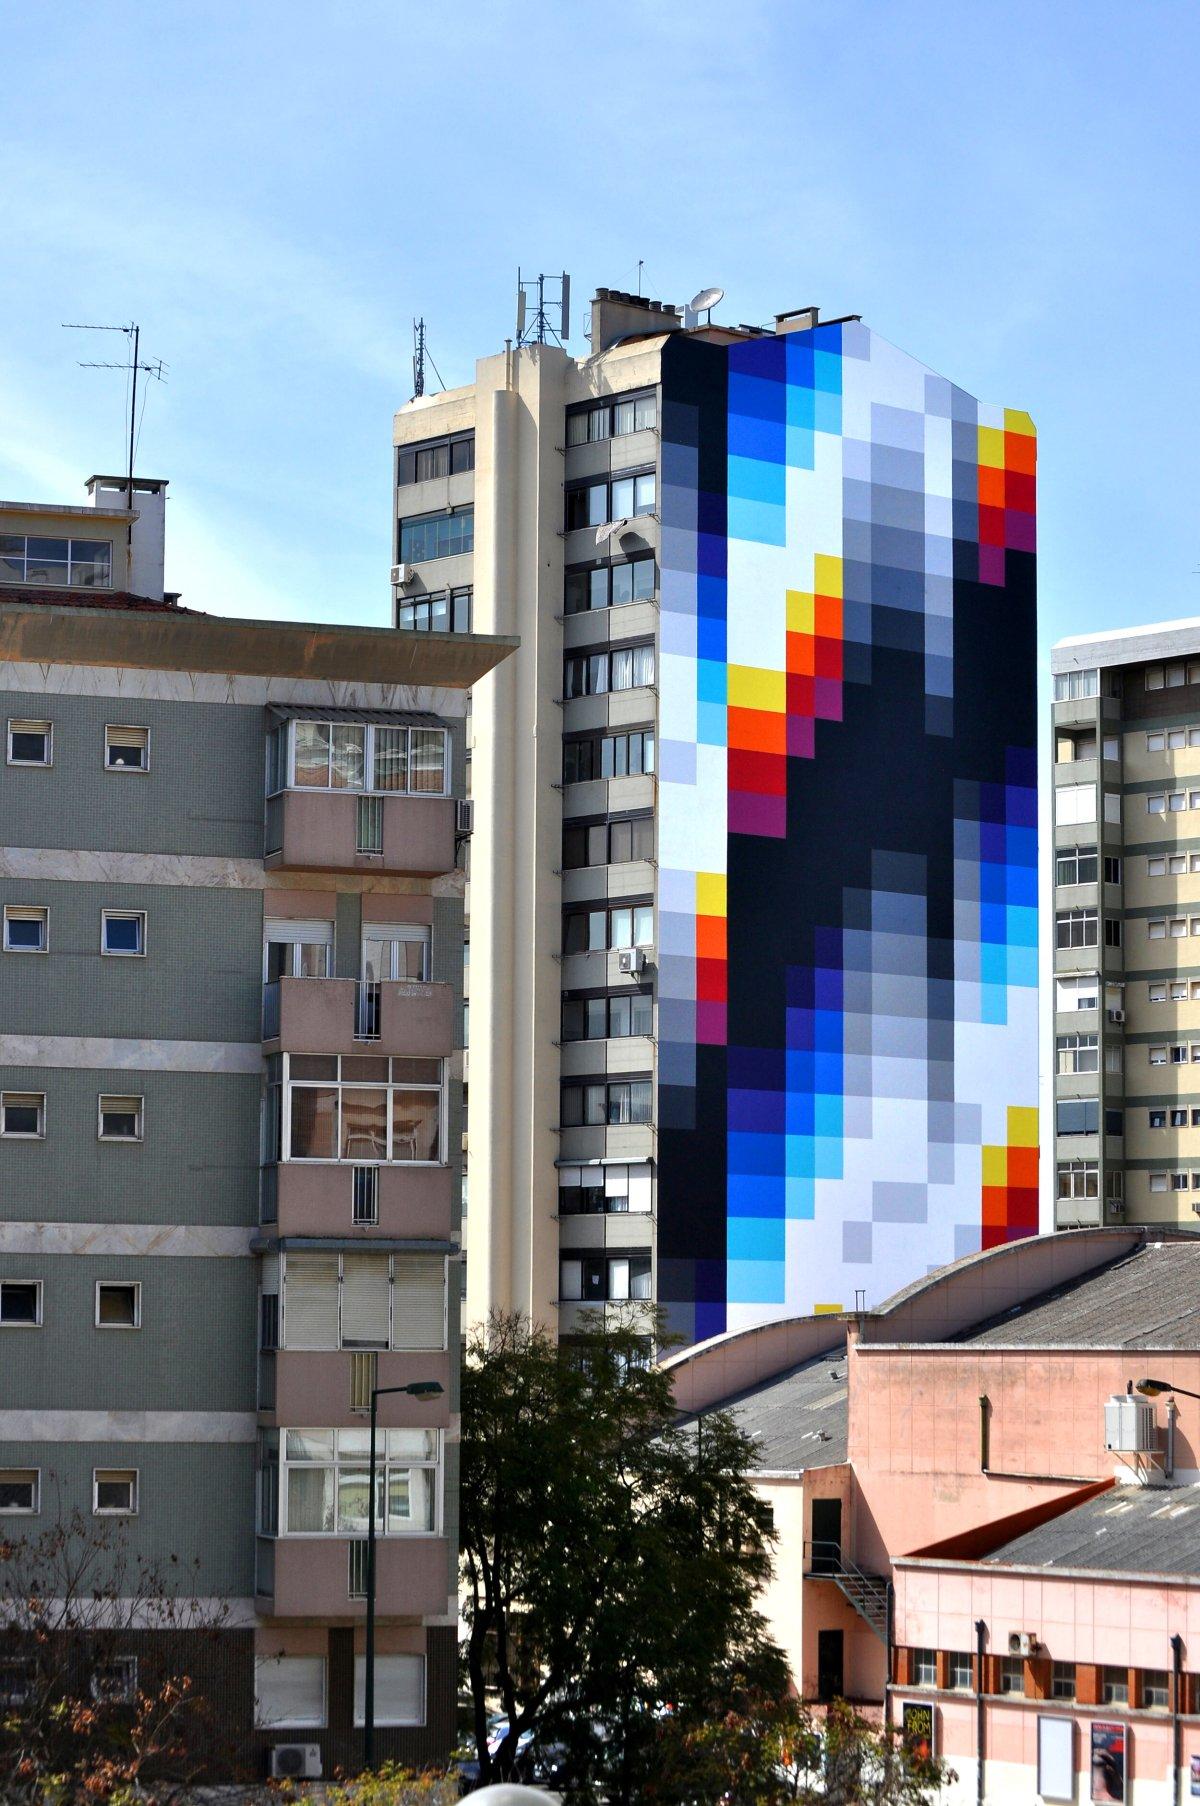 Futuristic Graffiti Glitches Mural - Felipe Pantone for Lisbon Mural for LisbonWeek